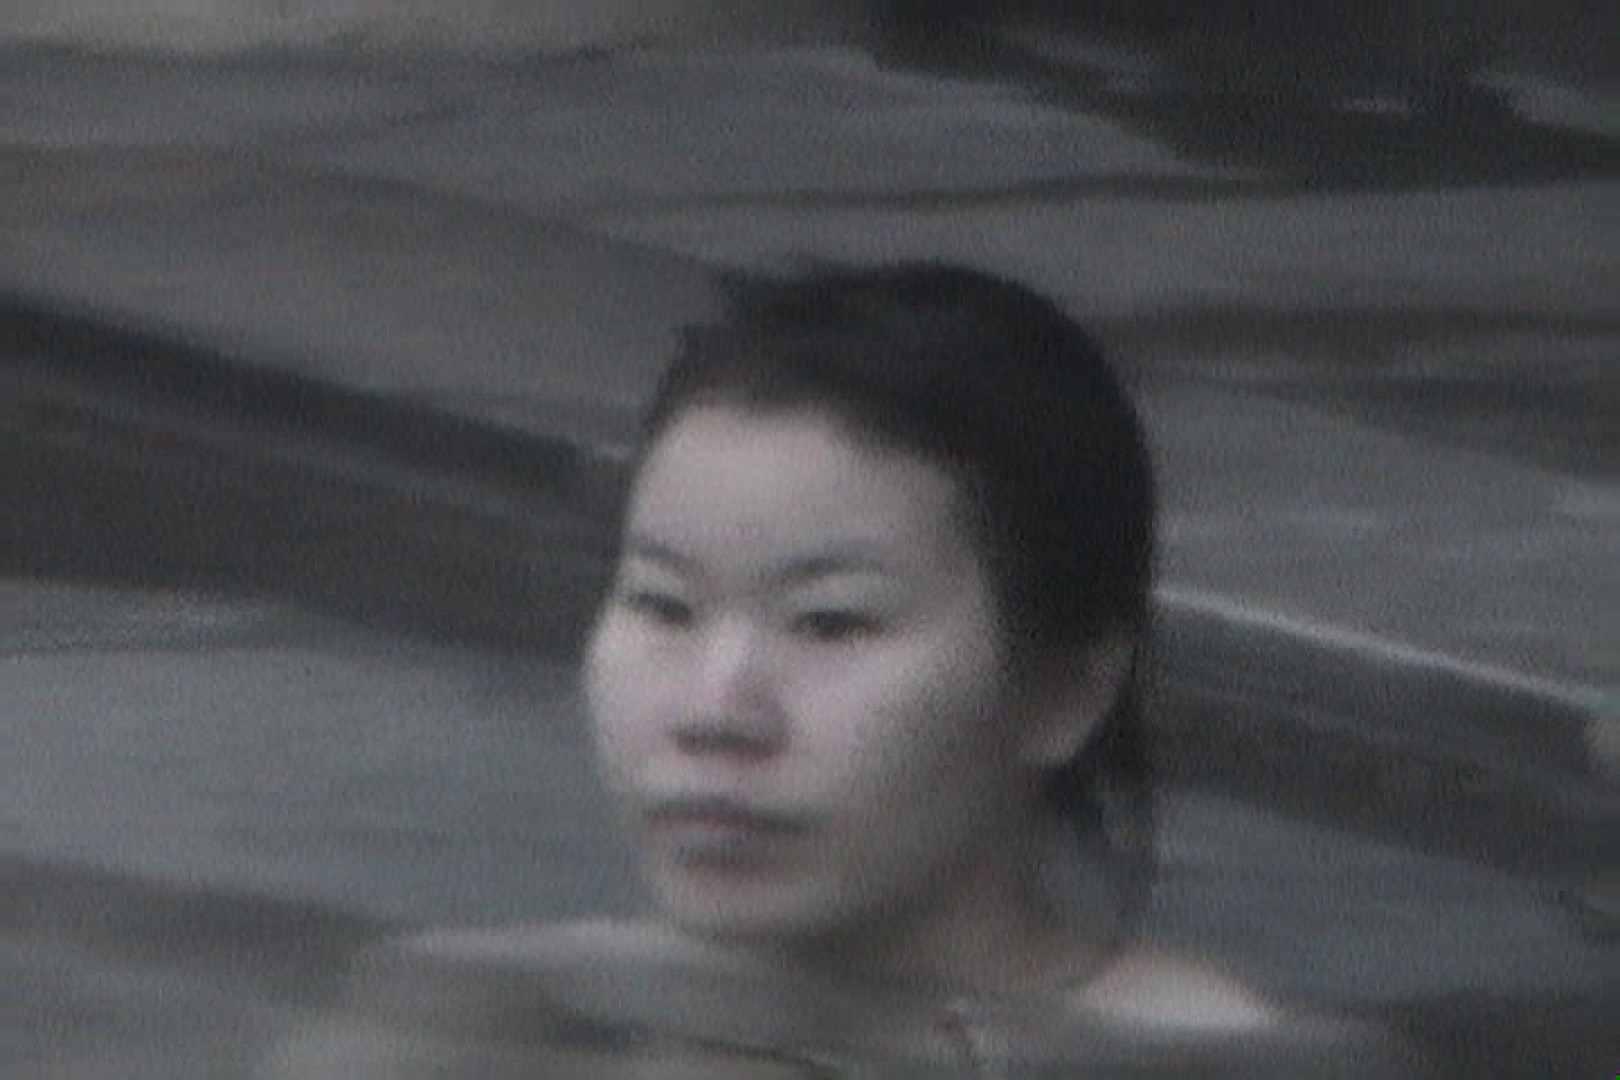 Aquaな露天風呂Vol.556 露天風呂編  99PIX 14